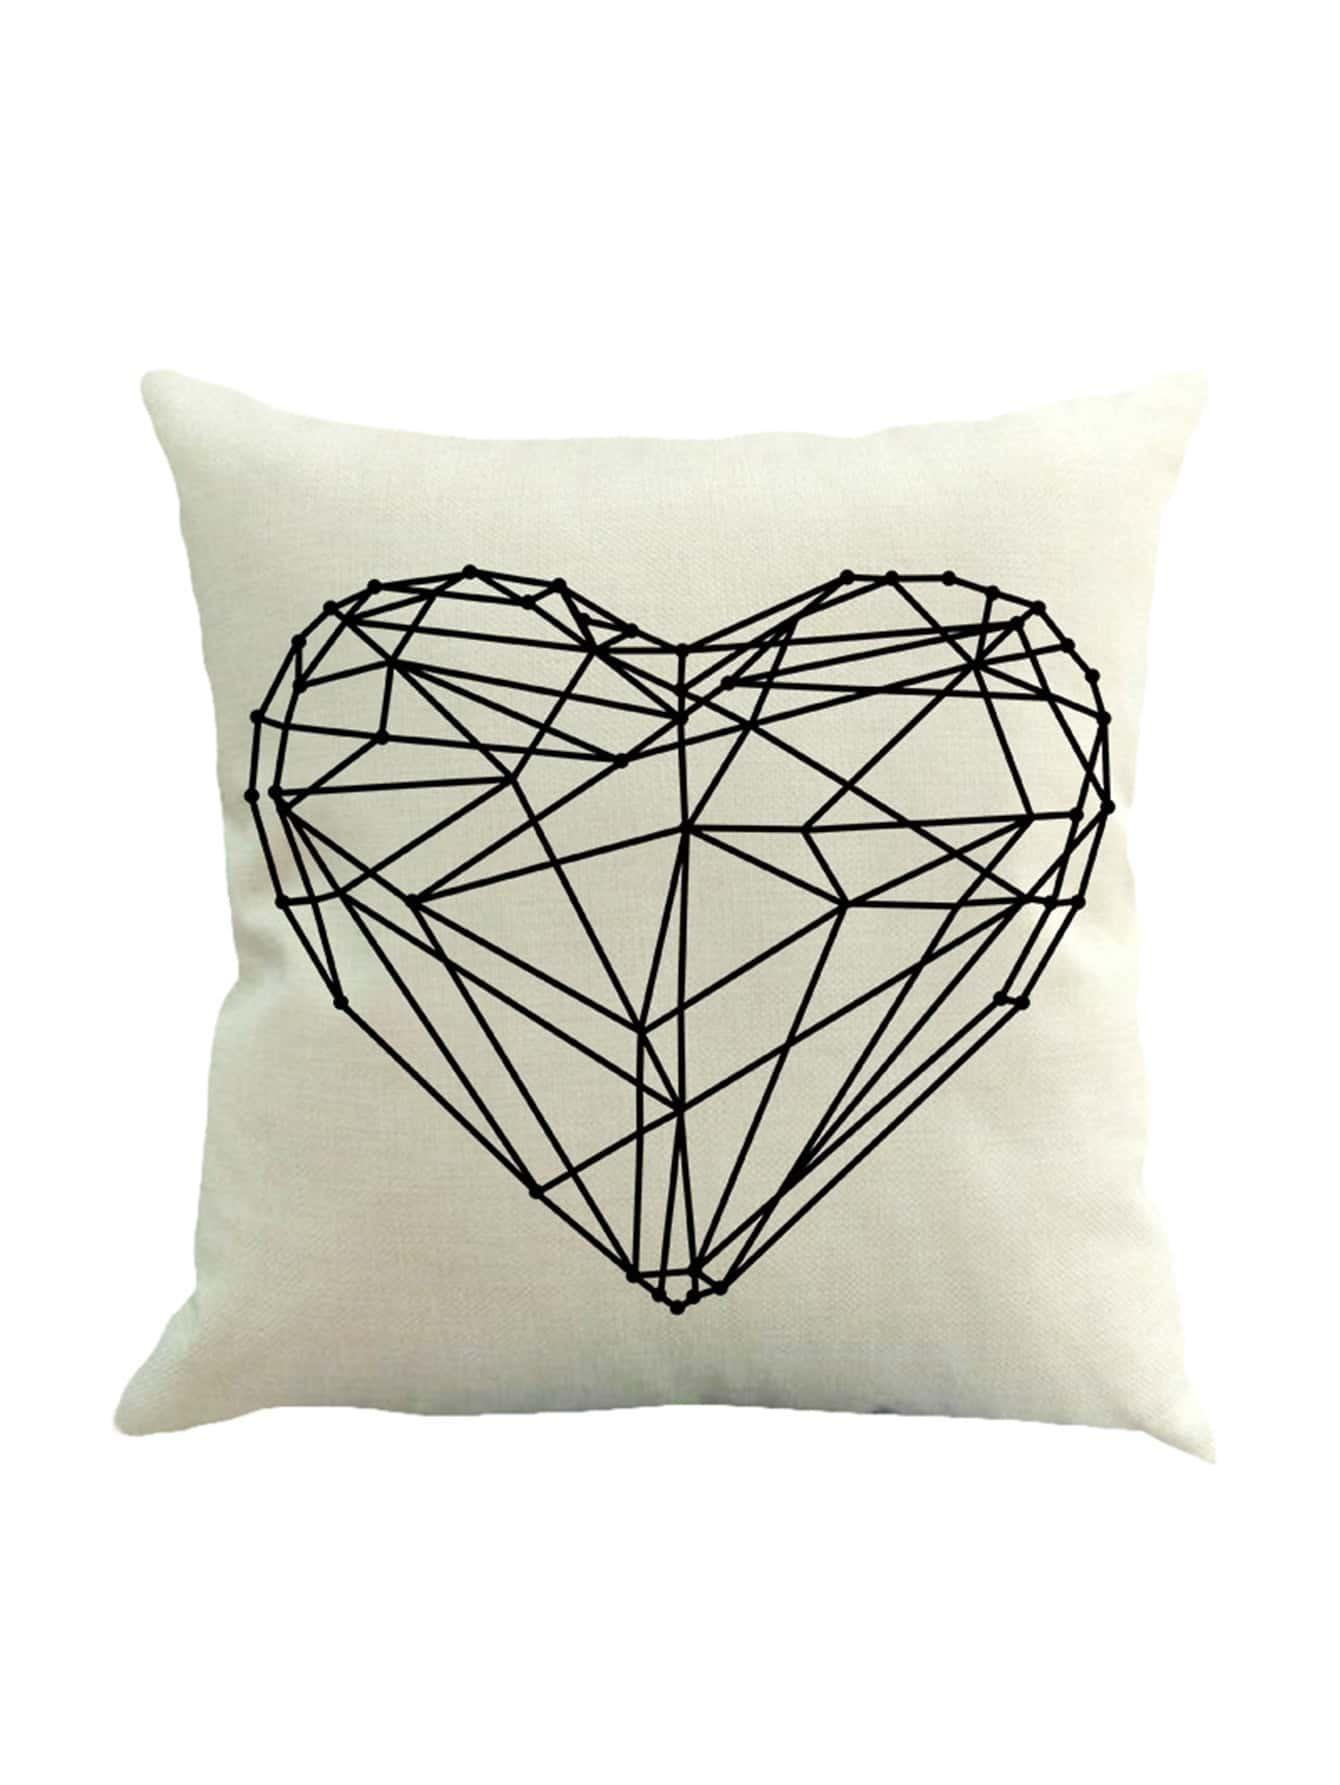 Geometric Heart Print Pillowcase Cover